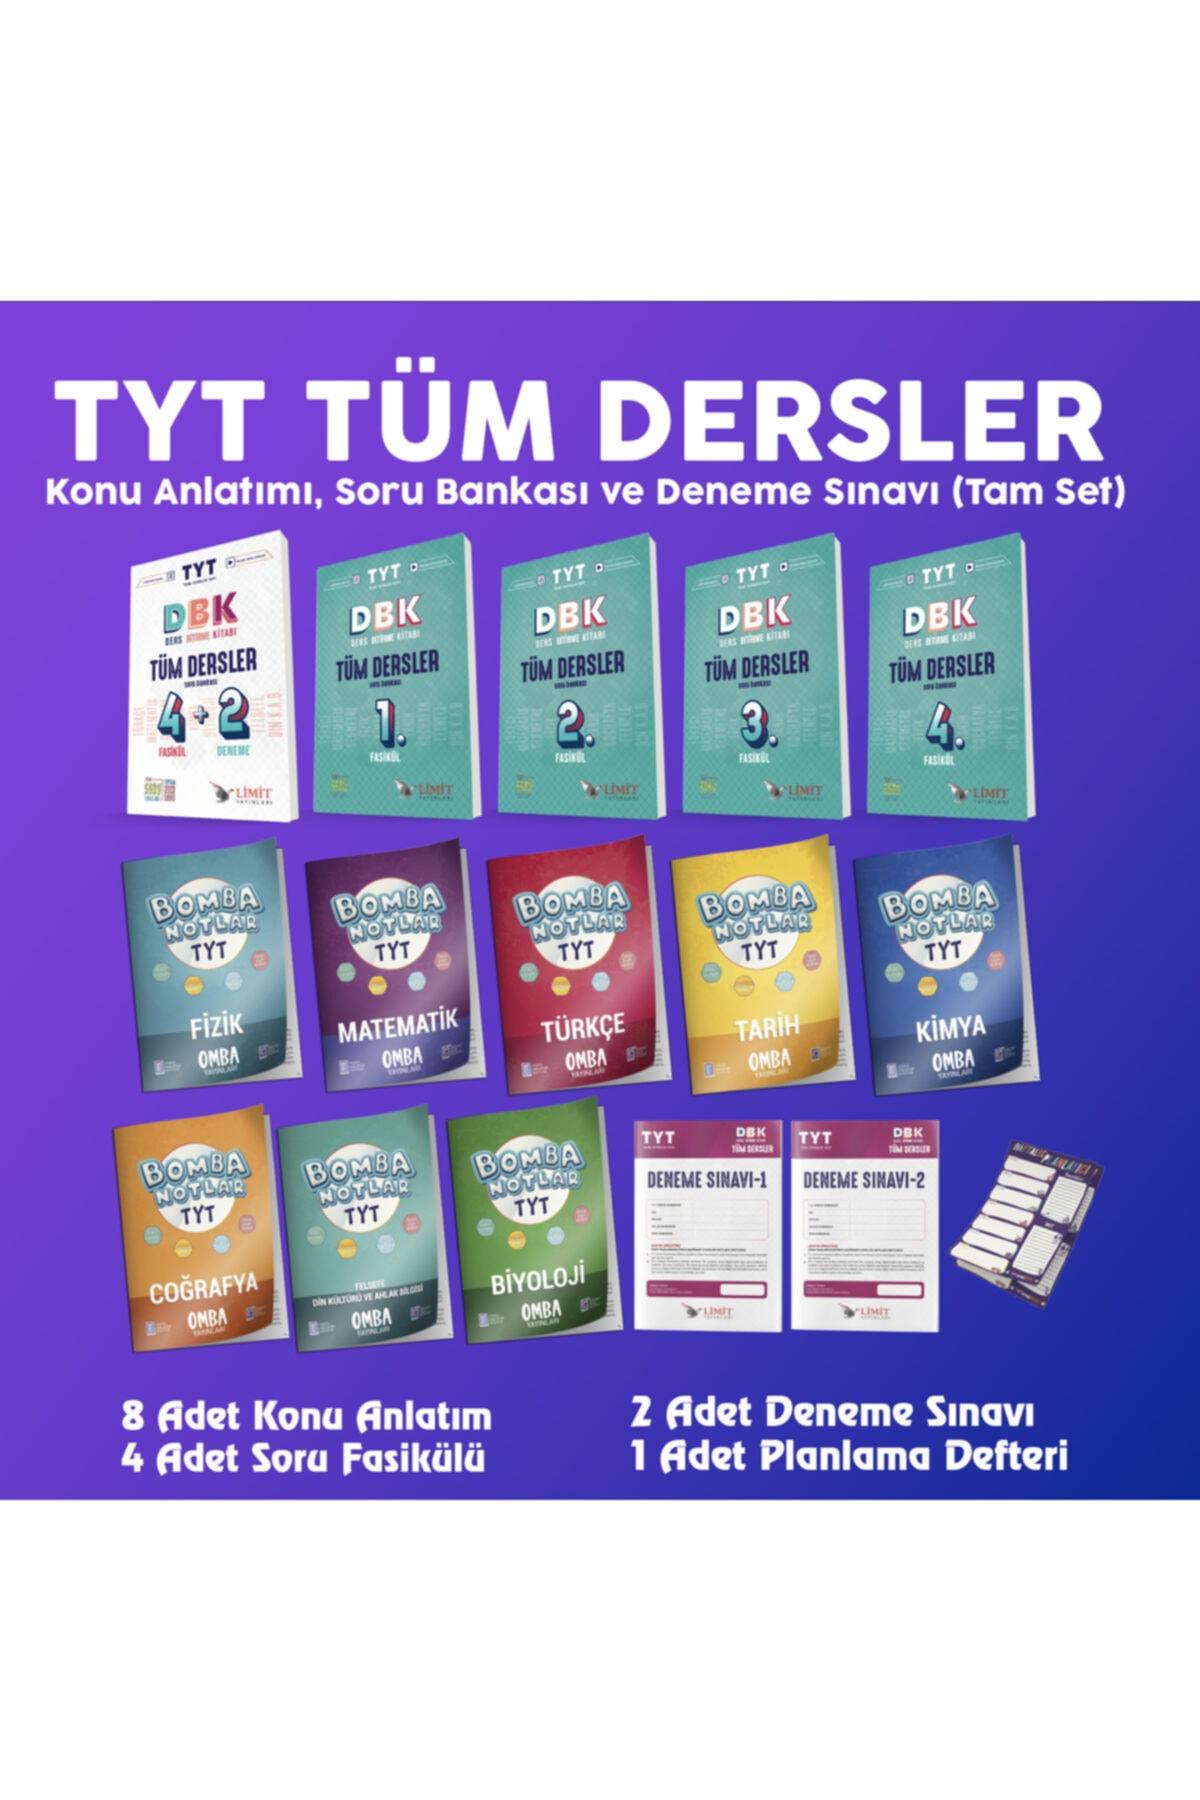 Limit Tyt Tüm Dersler Seti (OMBA-LİMİT)